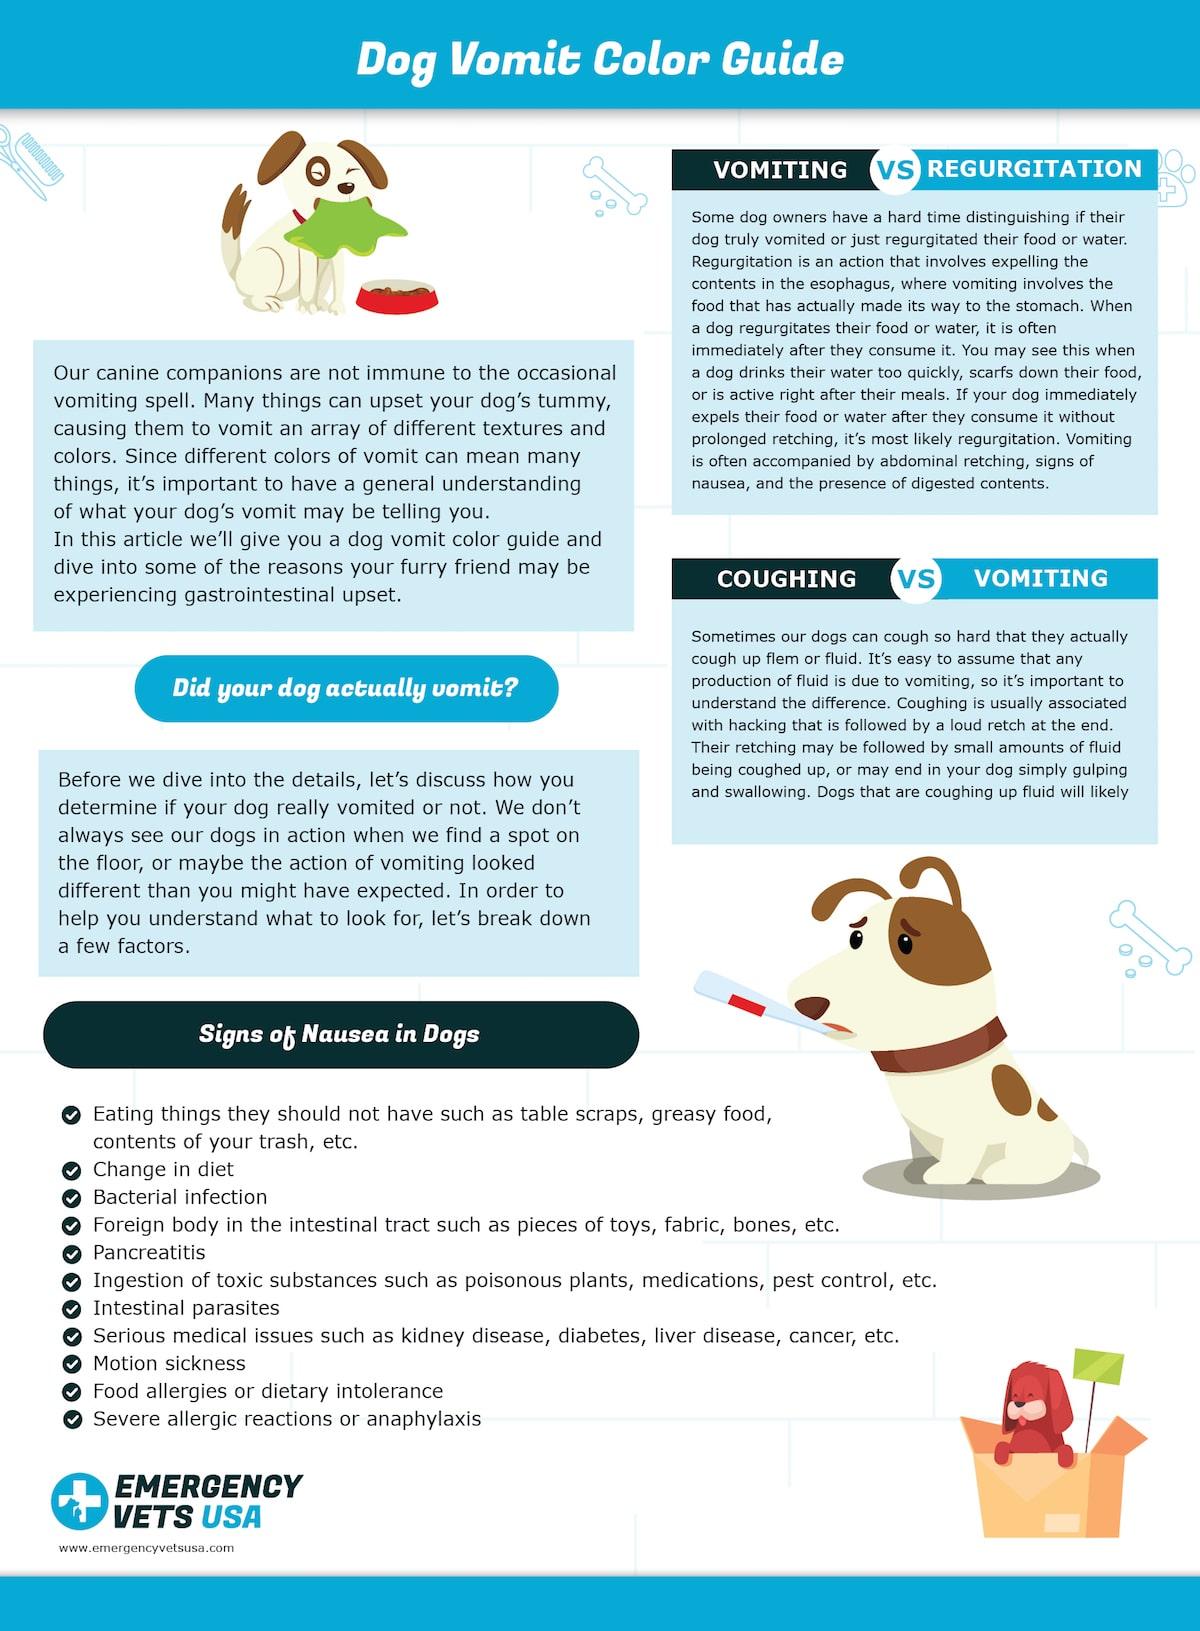 Dog Vomit Color Guide Chart